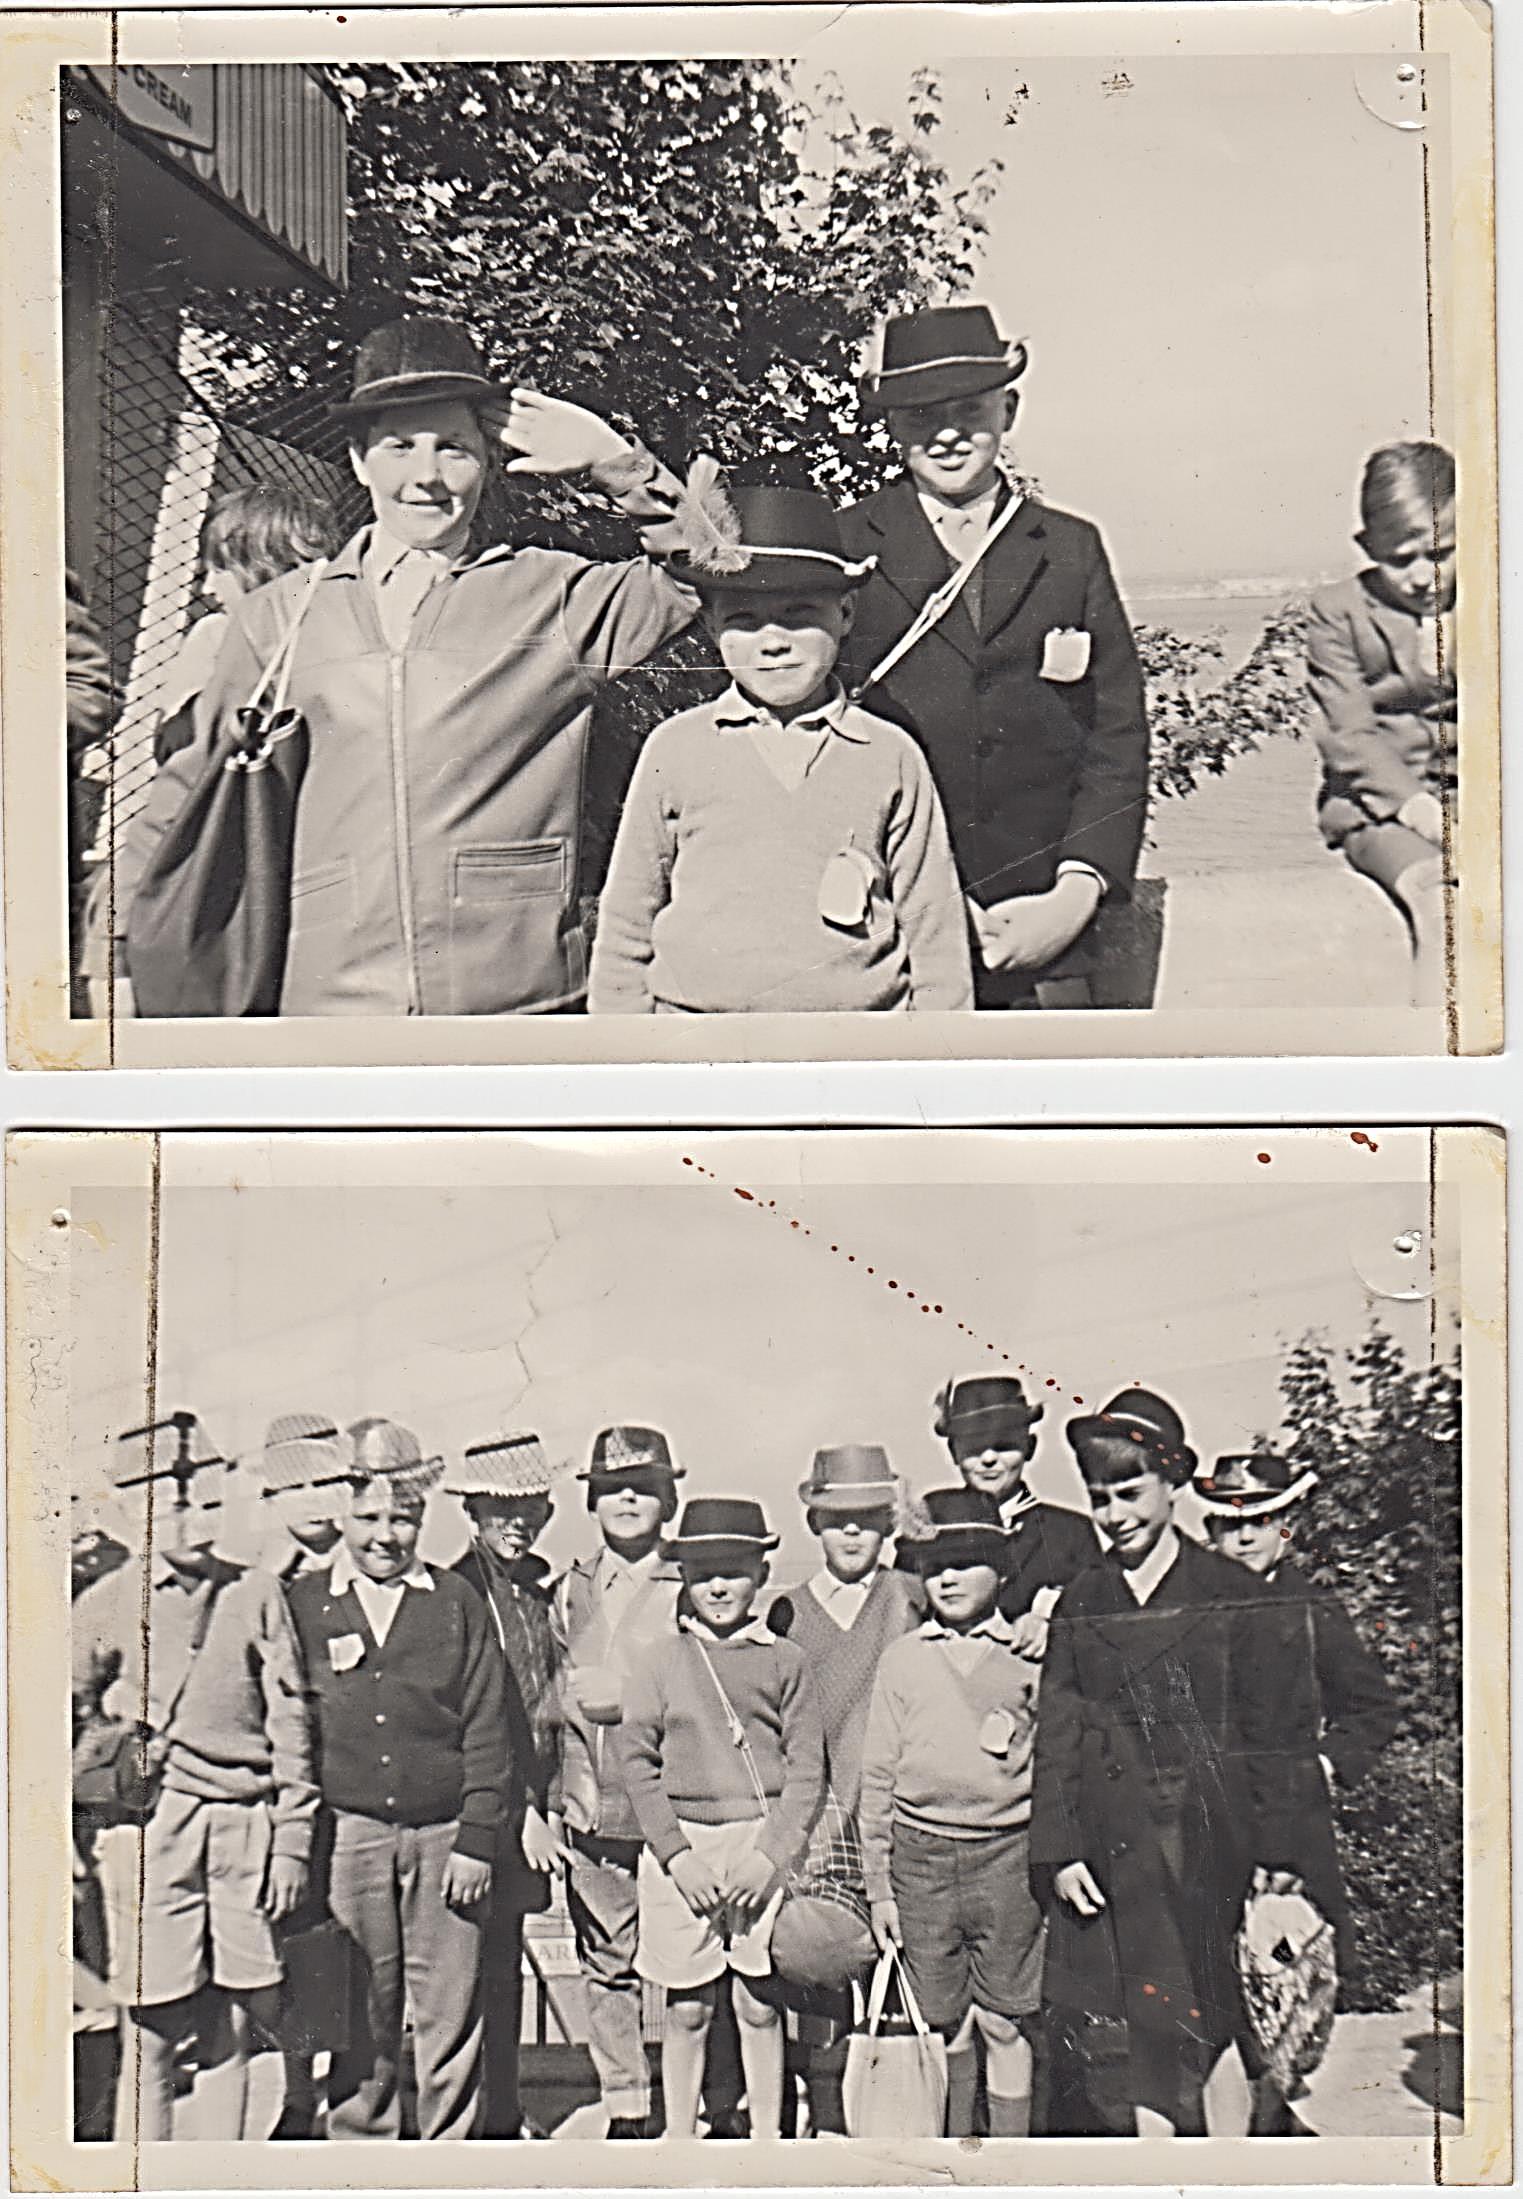 1960_trip_to_liverpool_001.jpg